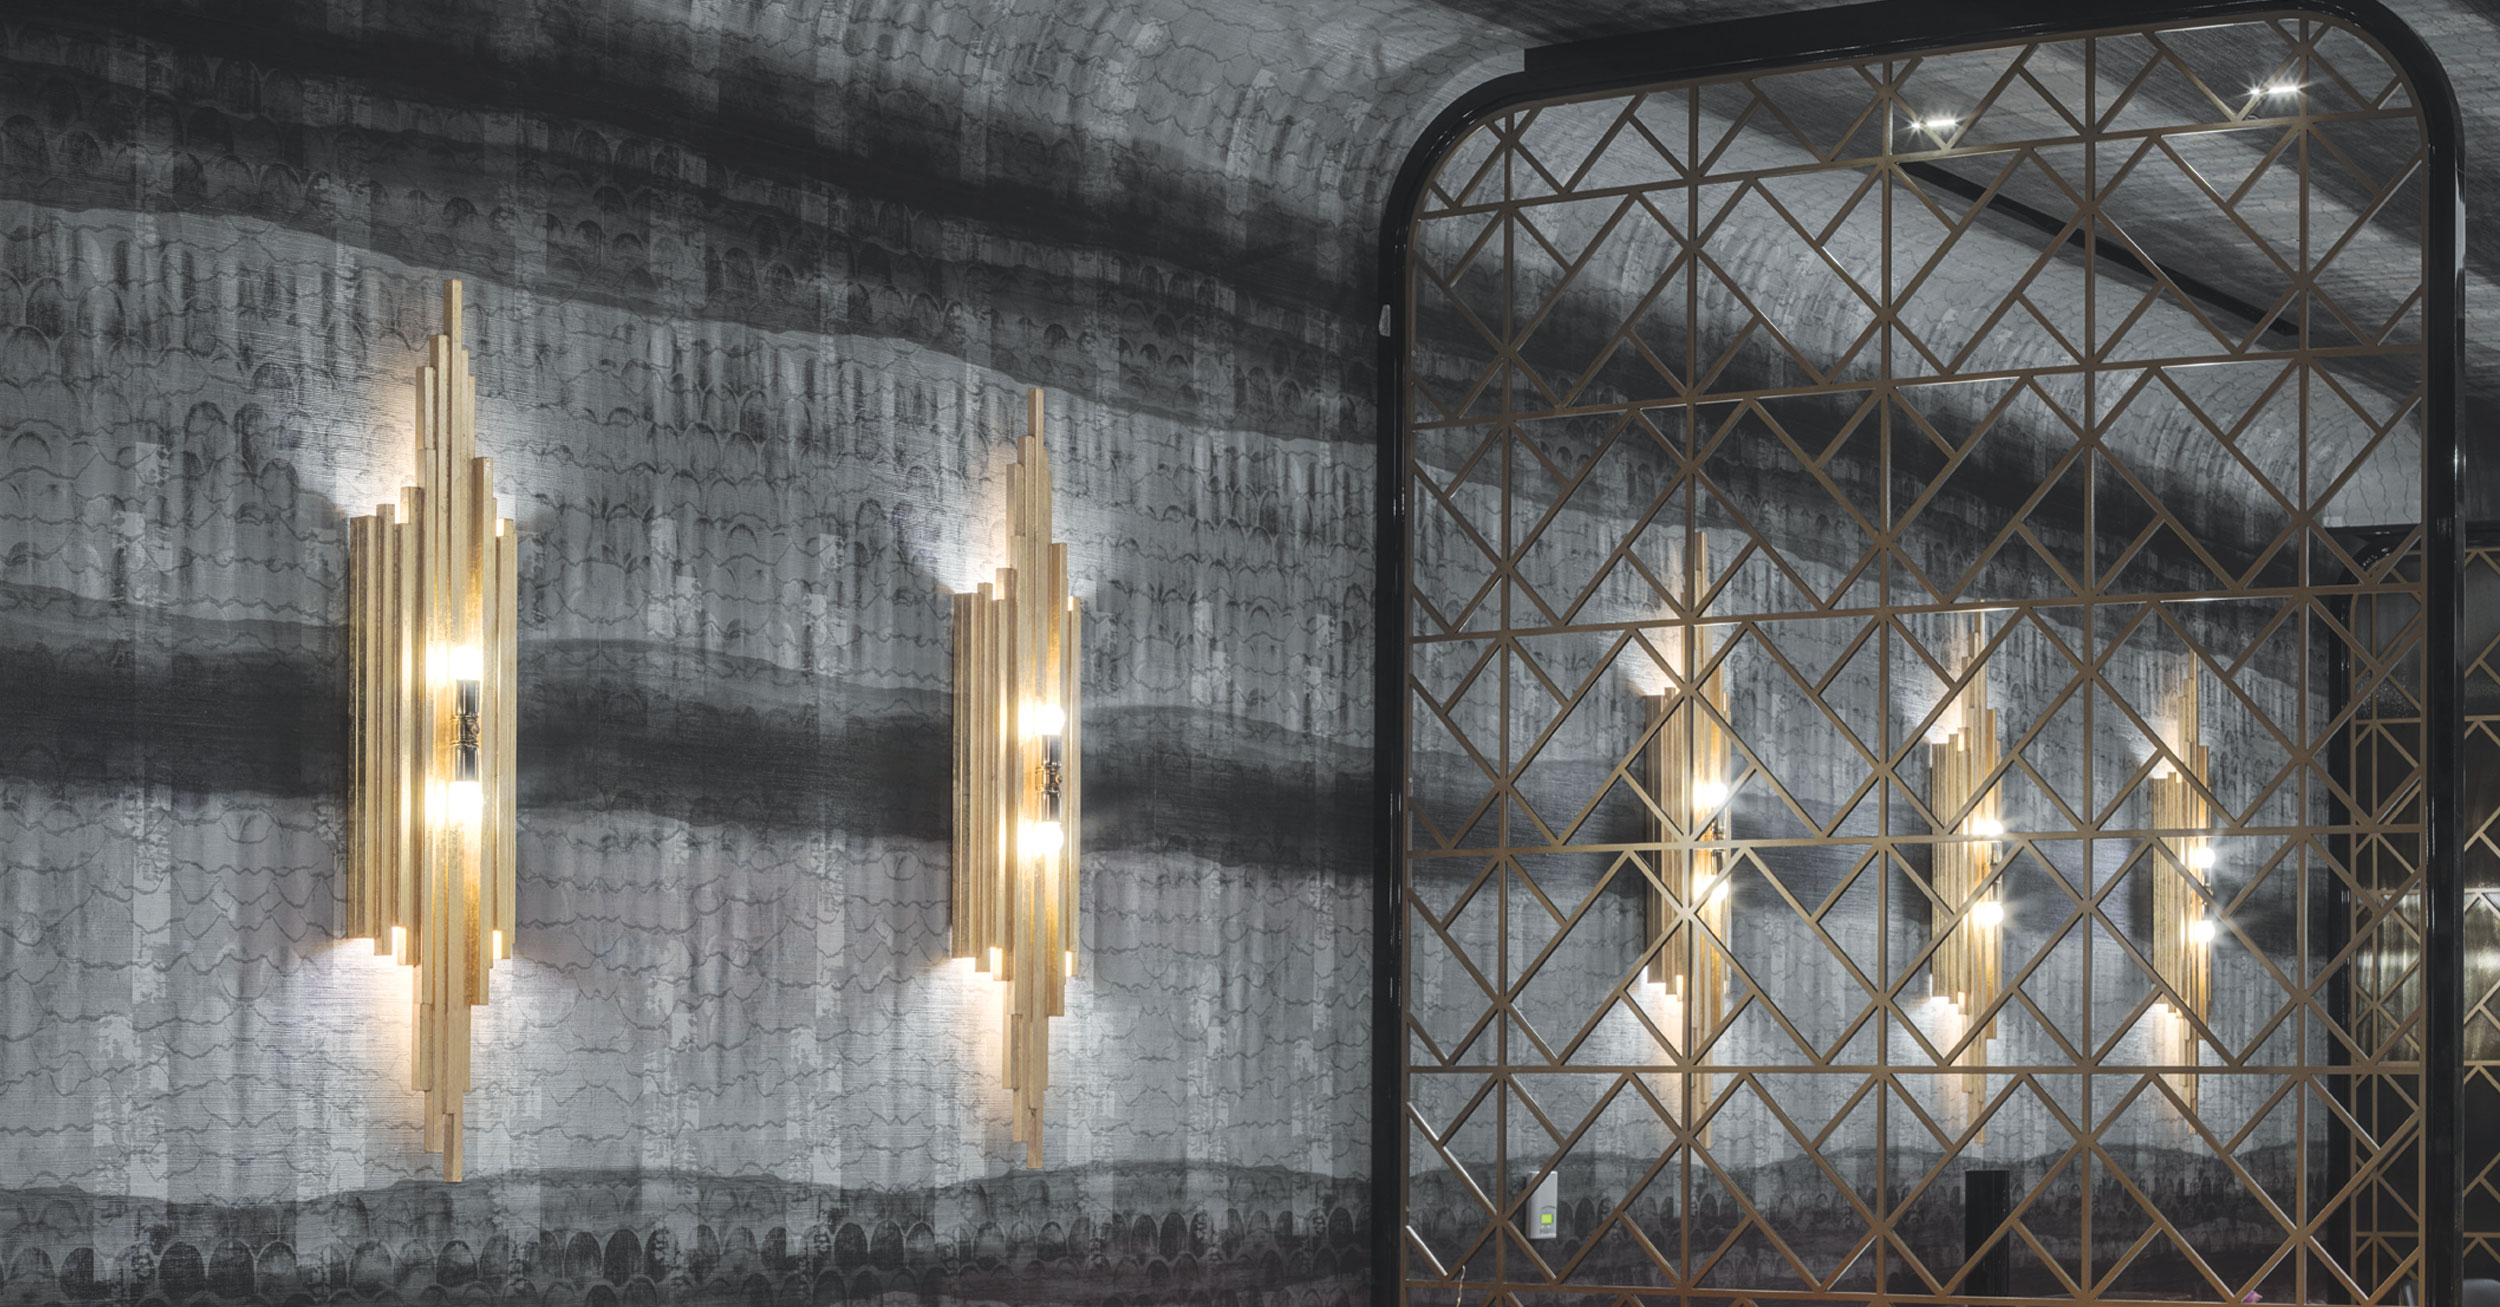 Immersive Custom Wallcovering for Red Plate @ The Cosmopolitan Las Vegas